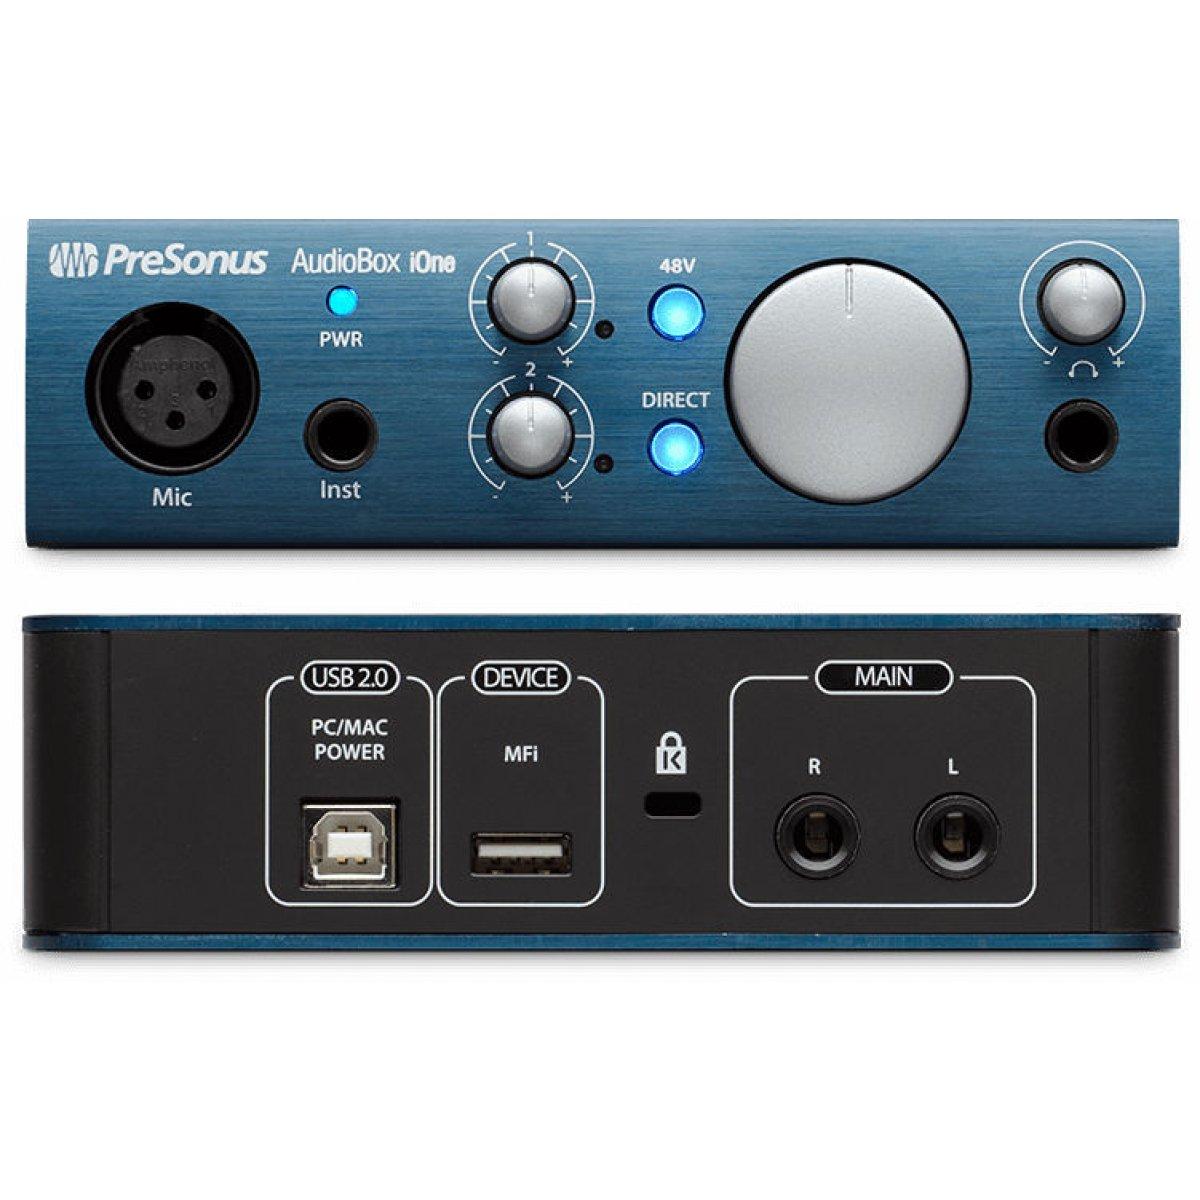 Presonus AUDIOBOX iONE PRESONUS AudioBox iOne